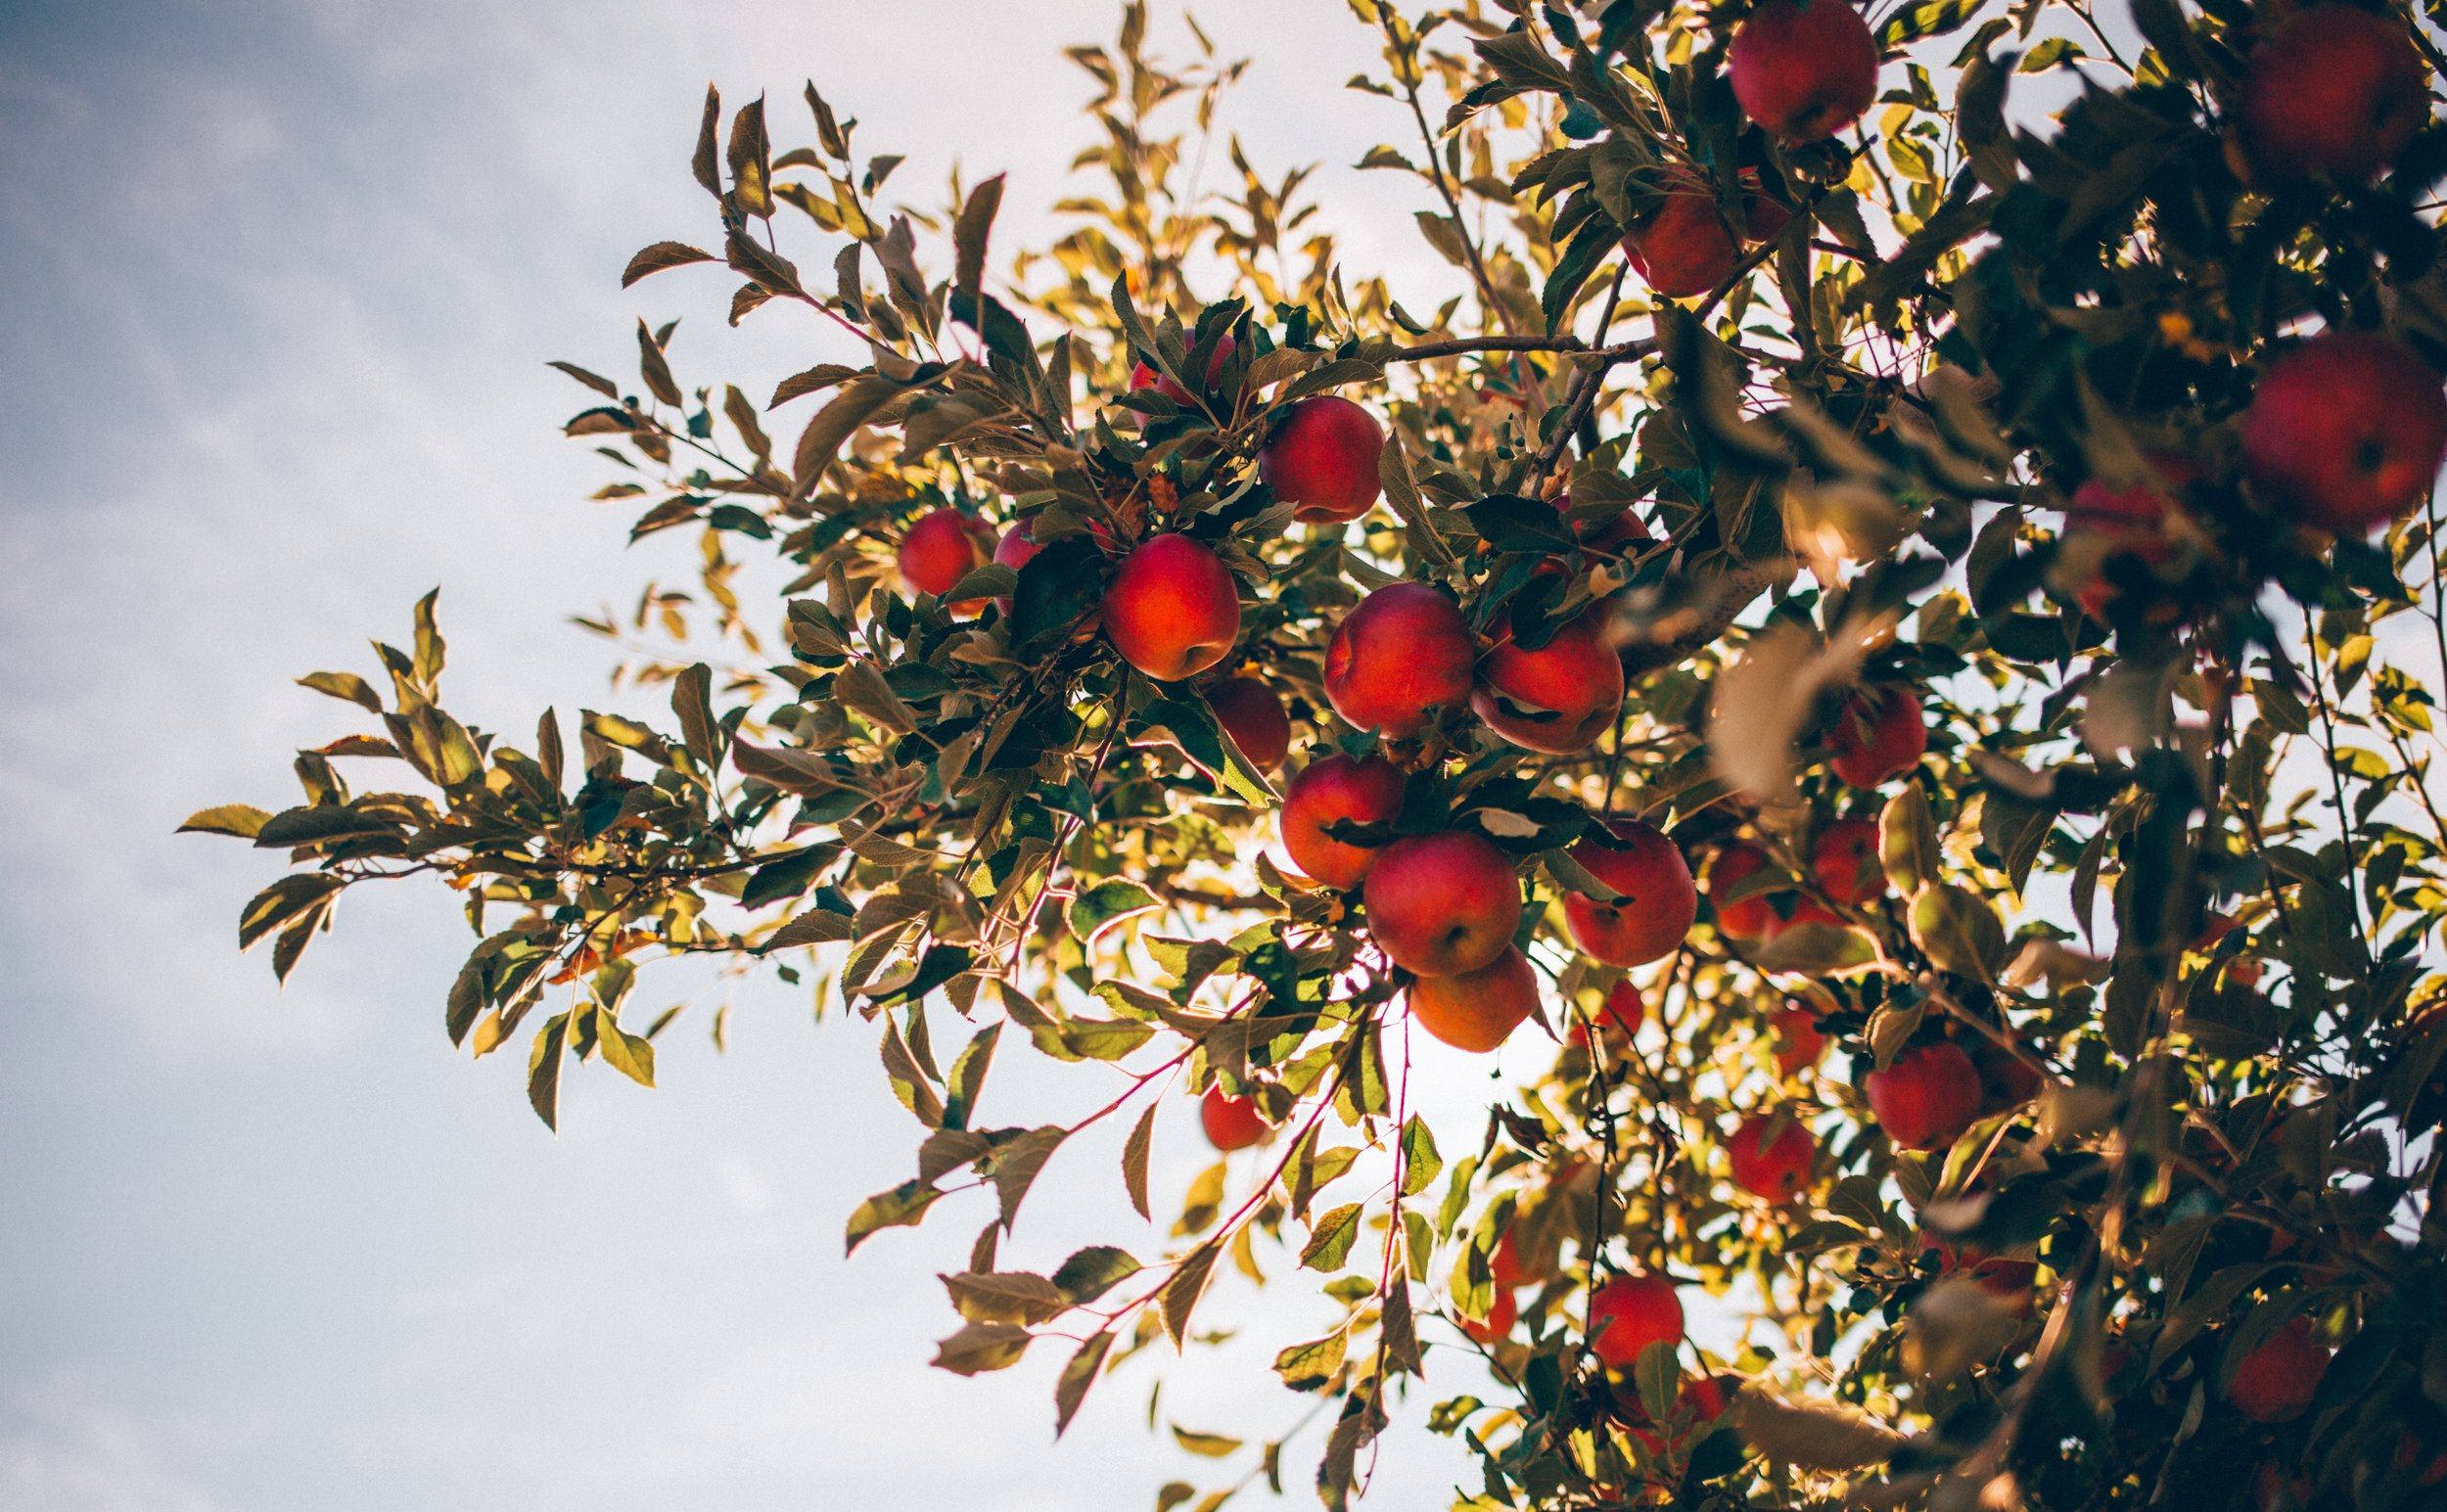 Johnson's Orchards at Peaks of Otter Winery - 1218 Elmos RoadBedford, VA 24523